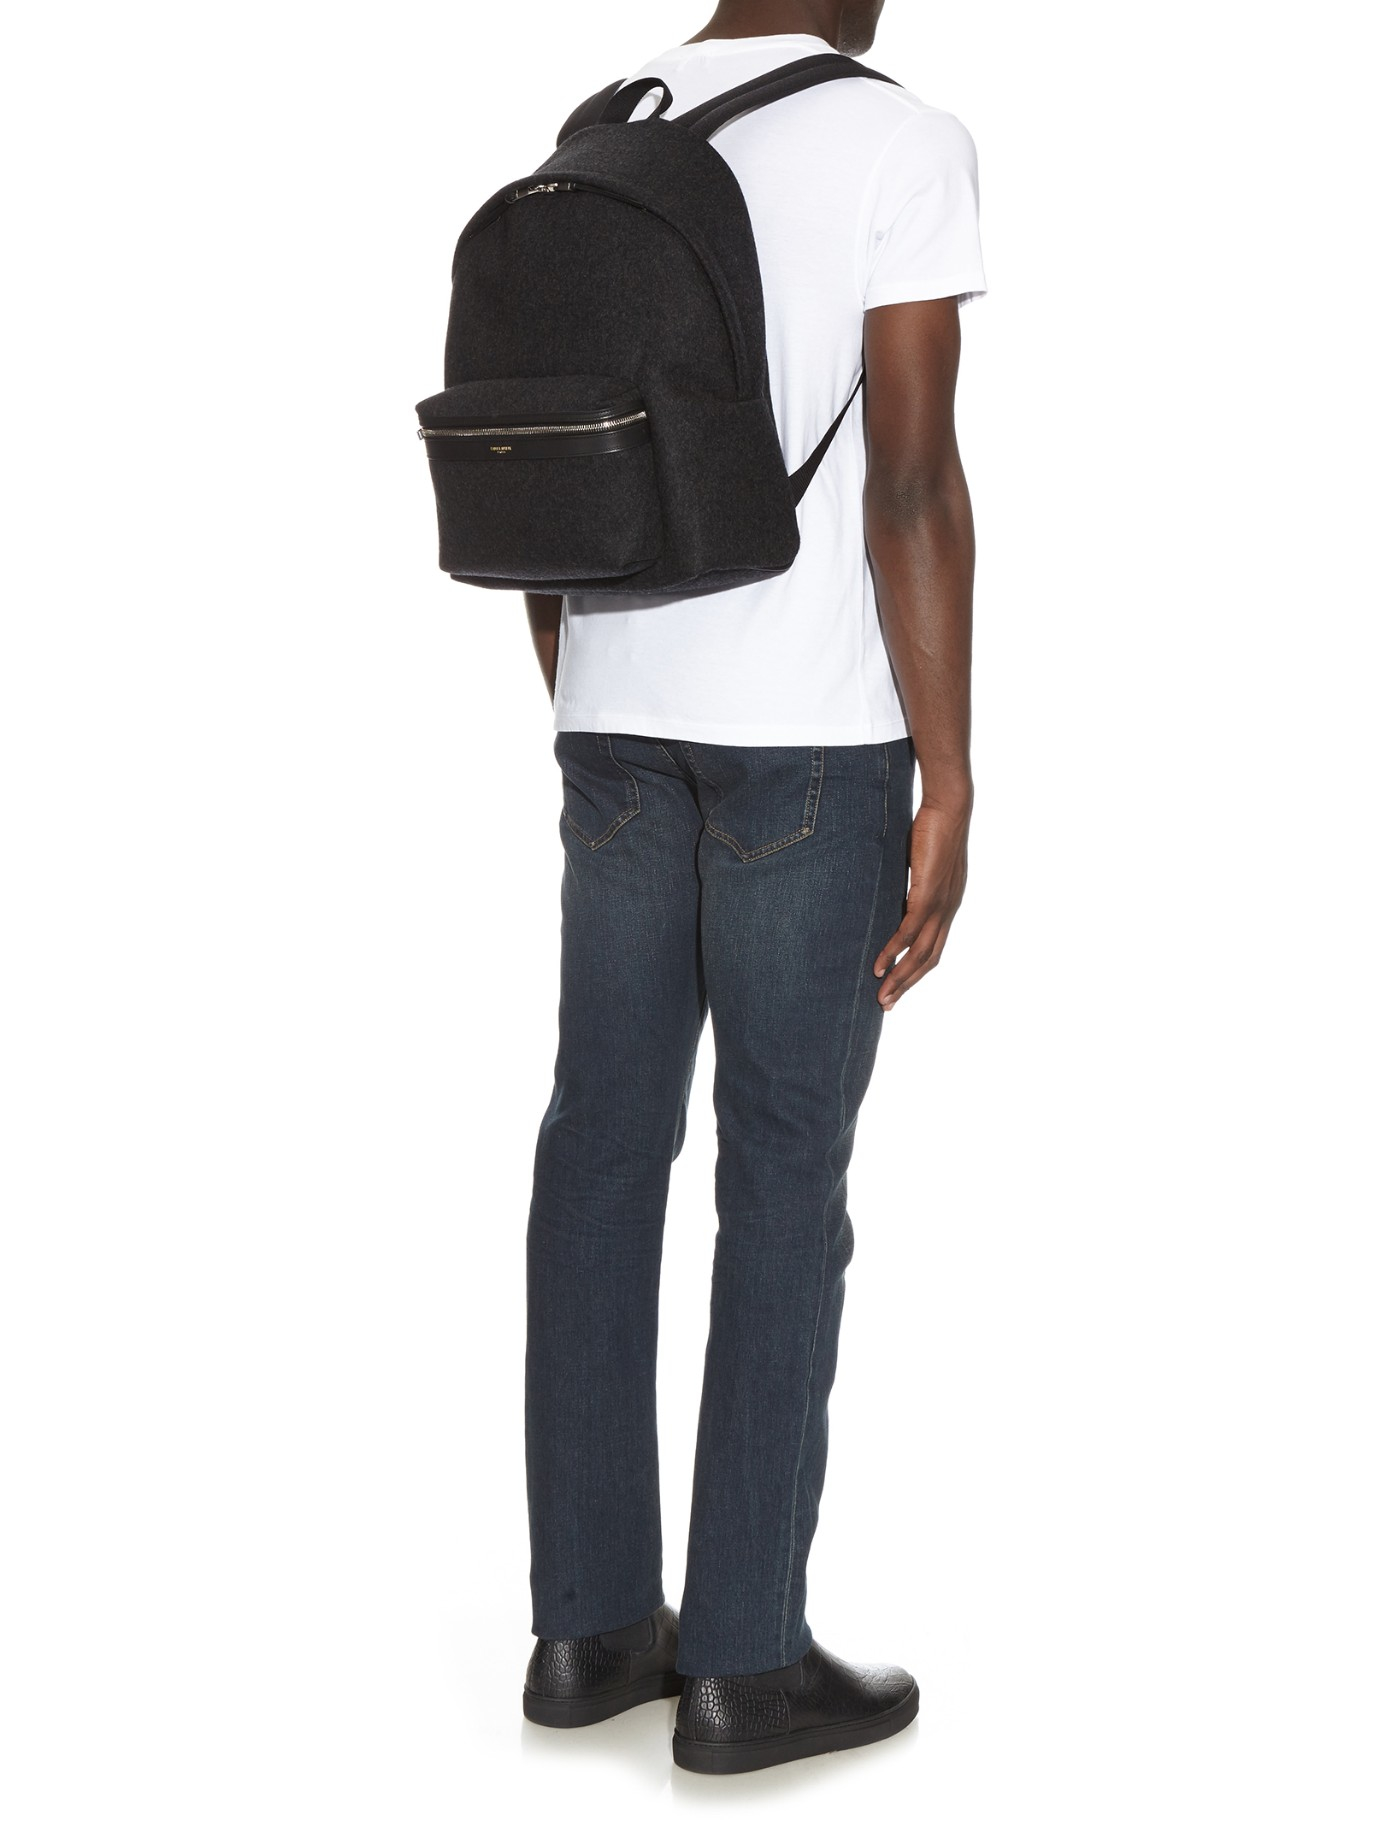 85d8e9829 Saint Laurent Flannel Backpack in Gray for Men - Lyst